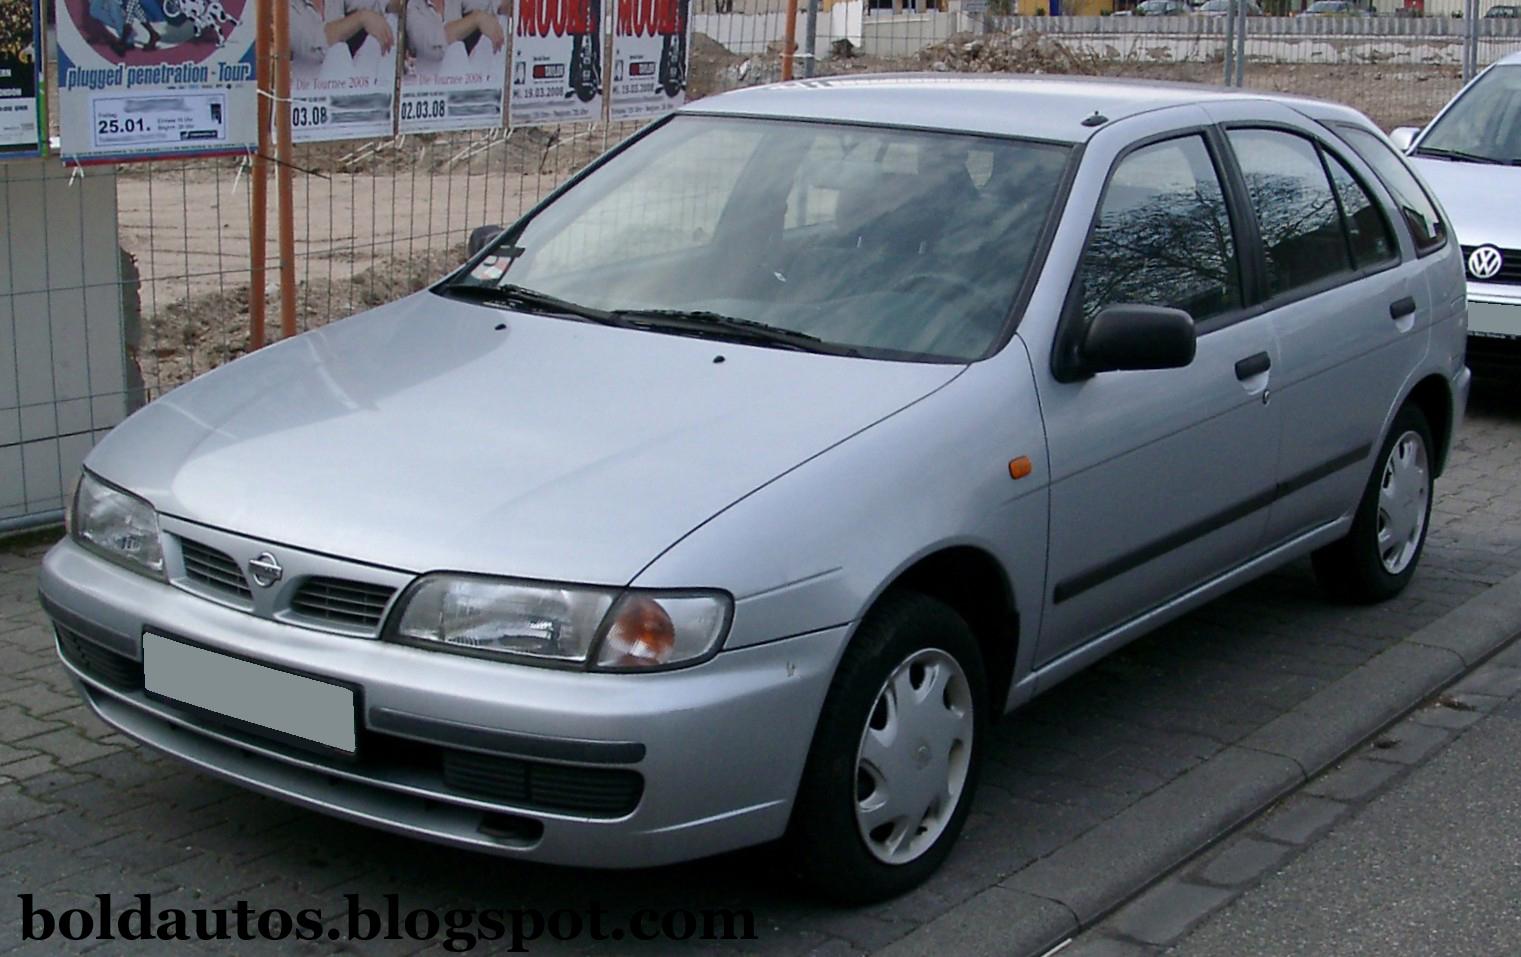 http://4.bp.blogspot.com/-Kwtd1jES1J0/TkrhL8i5C8I/AAAAAAAAADw/fuzrVdXyoY4/s1600/Nissan+Almera+First+Generation+N15.jpg